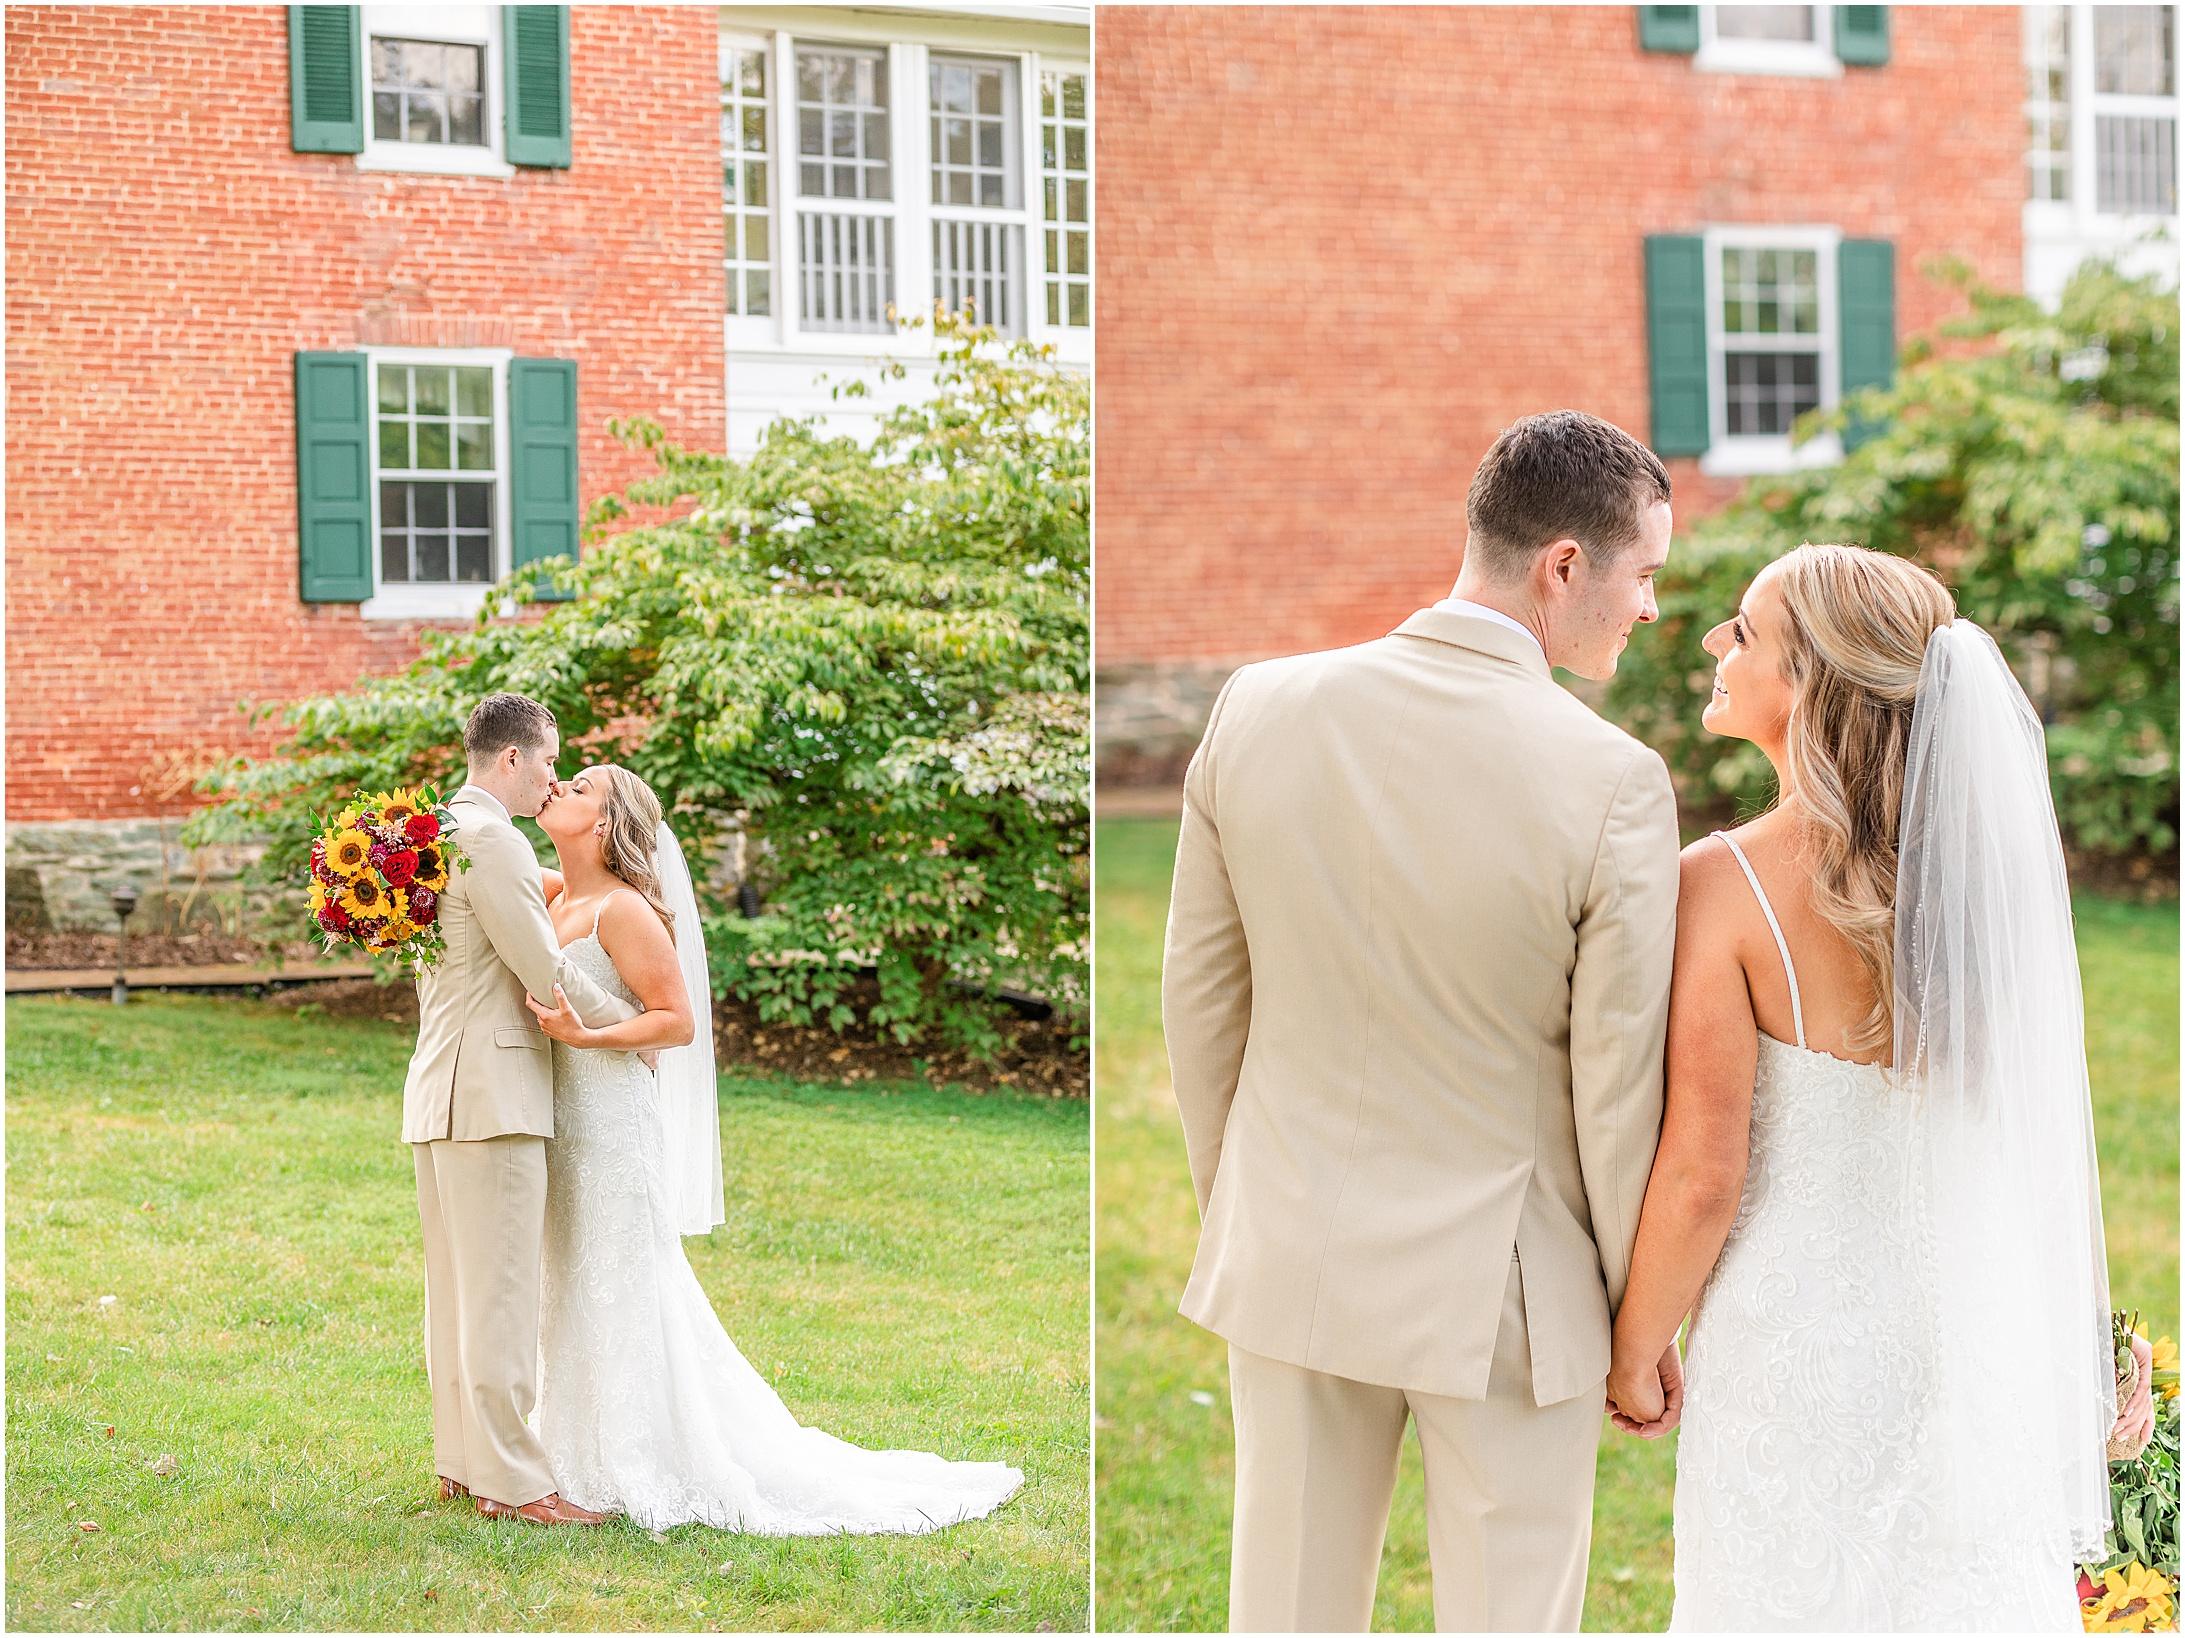 Christian-Royer-House-Wedding-Photos_0544.jpg